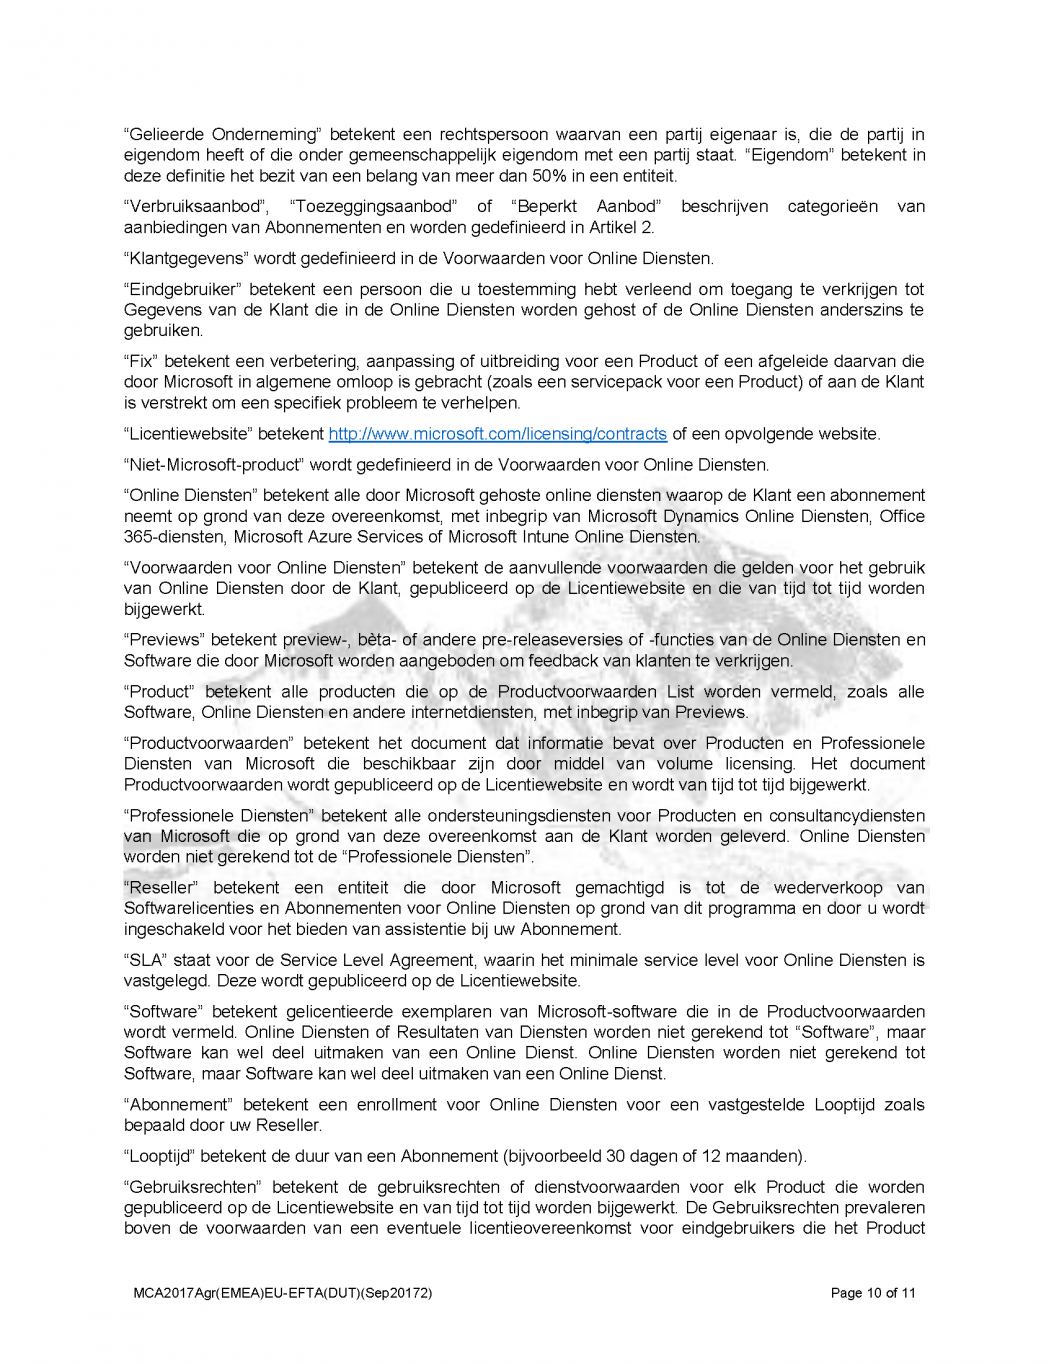 Microsoft MCA 2017 Dutch_Page_10